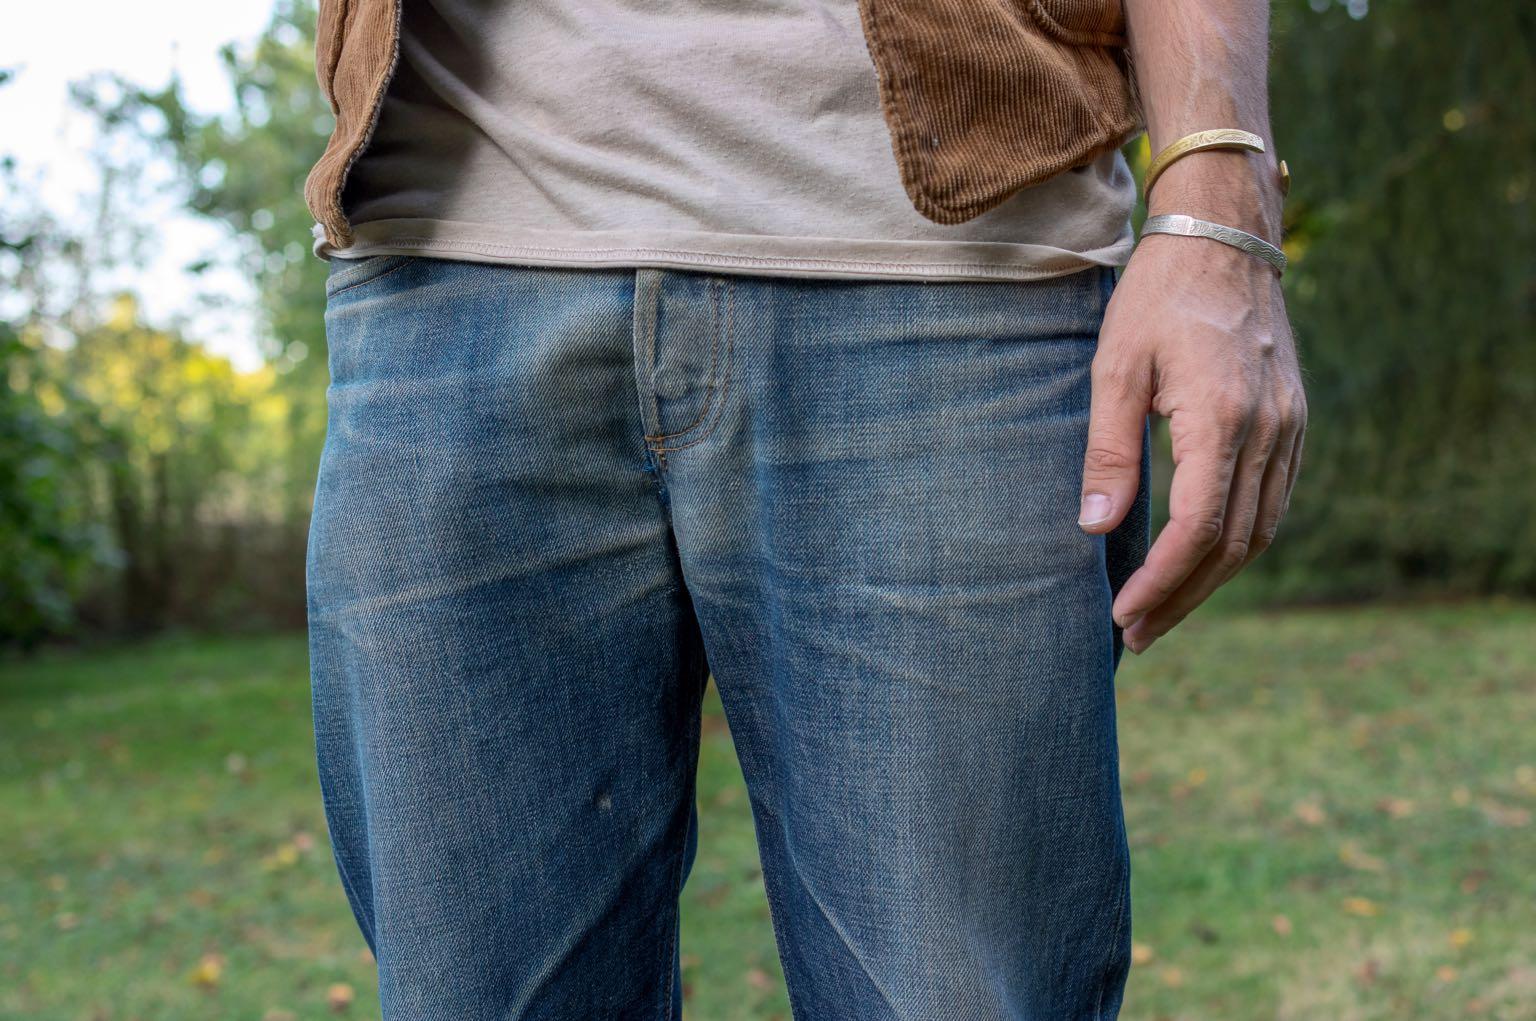 comment porter un jean coupe tapered - borali first sample denim